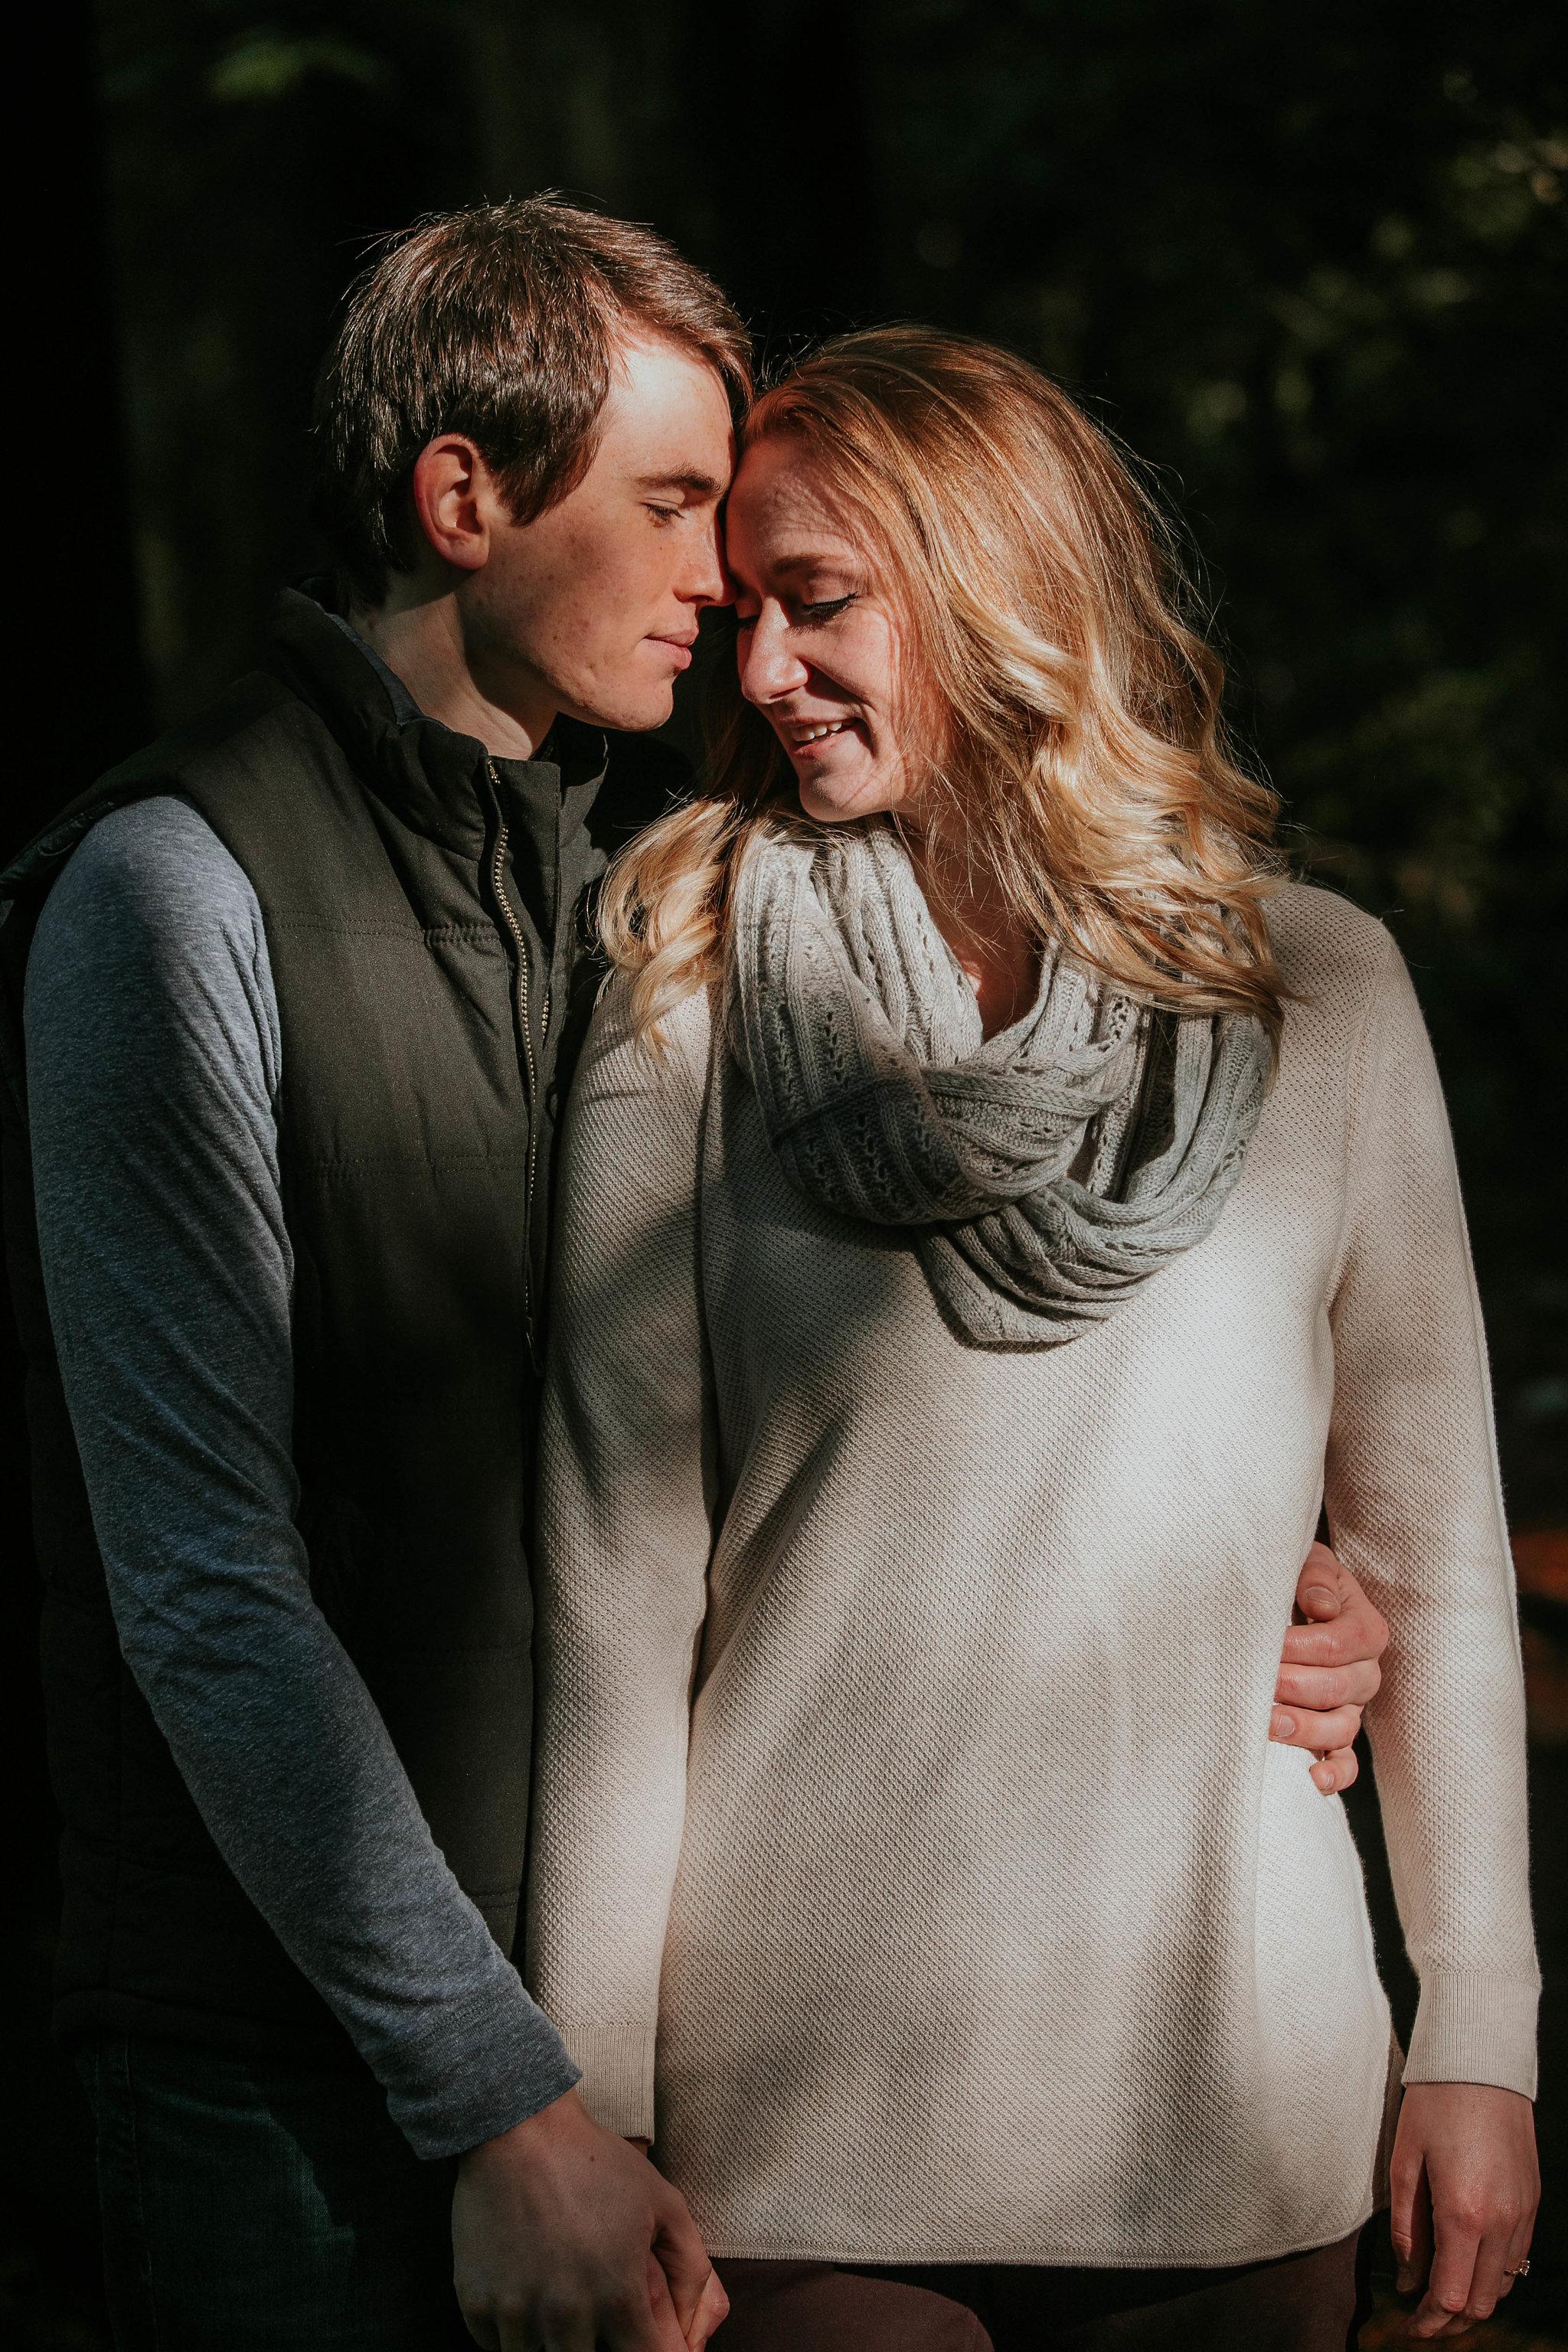 Mukilteo_Engagement_Anna+Vlad_Seattle_wedding_photographer_132.JPG